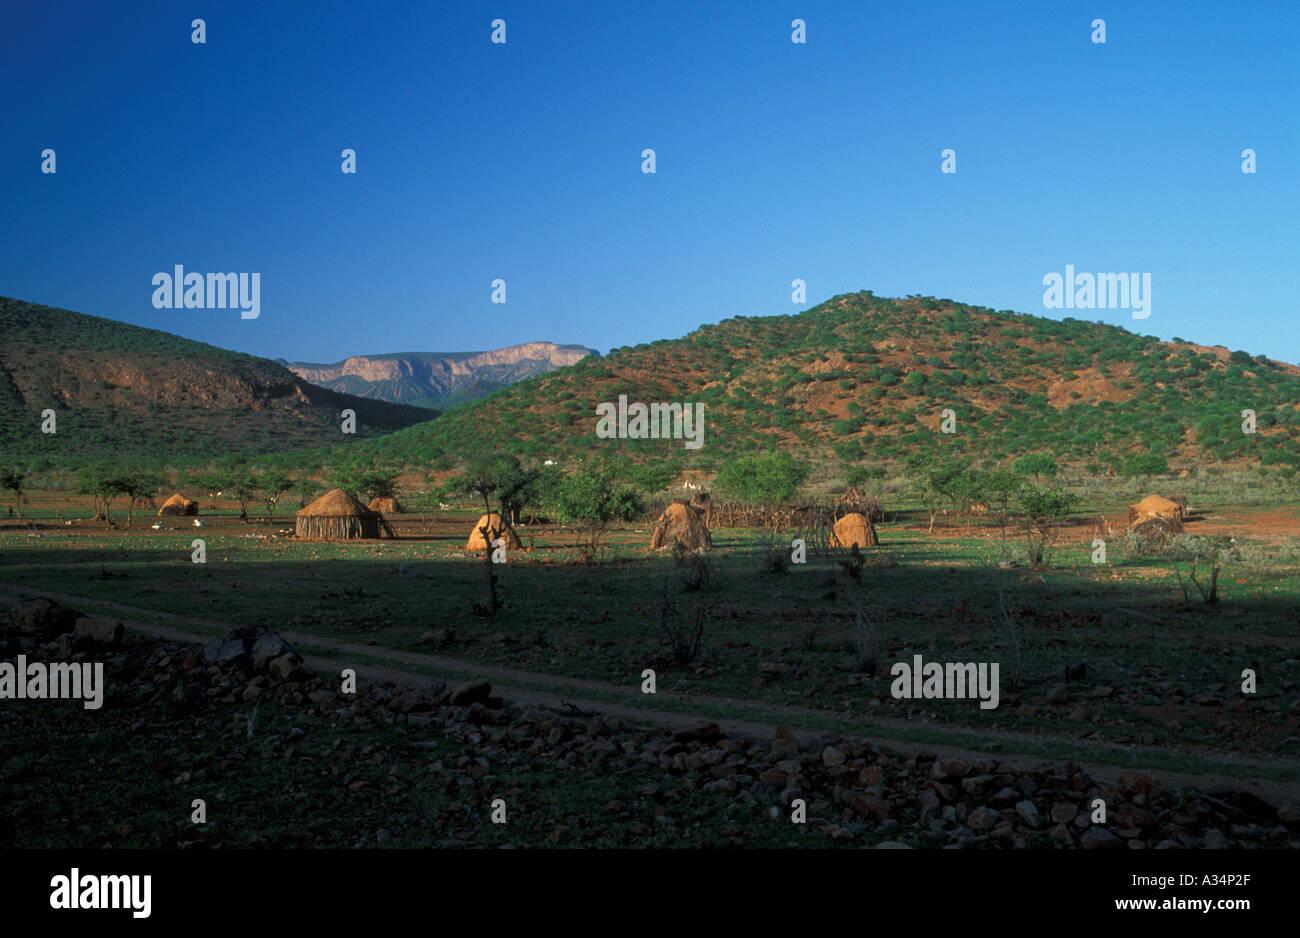 Huts and Kraal of Himba Ovahimba tribe nomadic people im Kaokoveld Namibia Africa - Stock Image